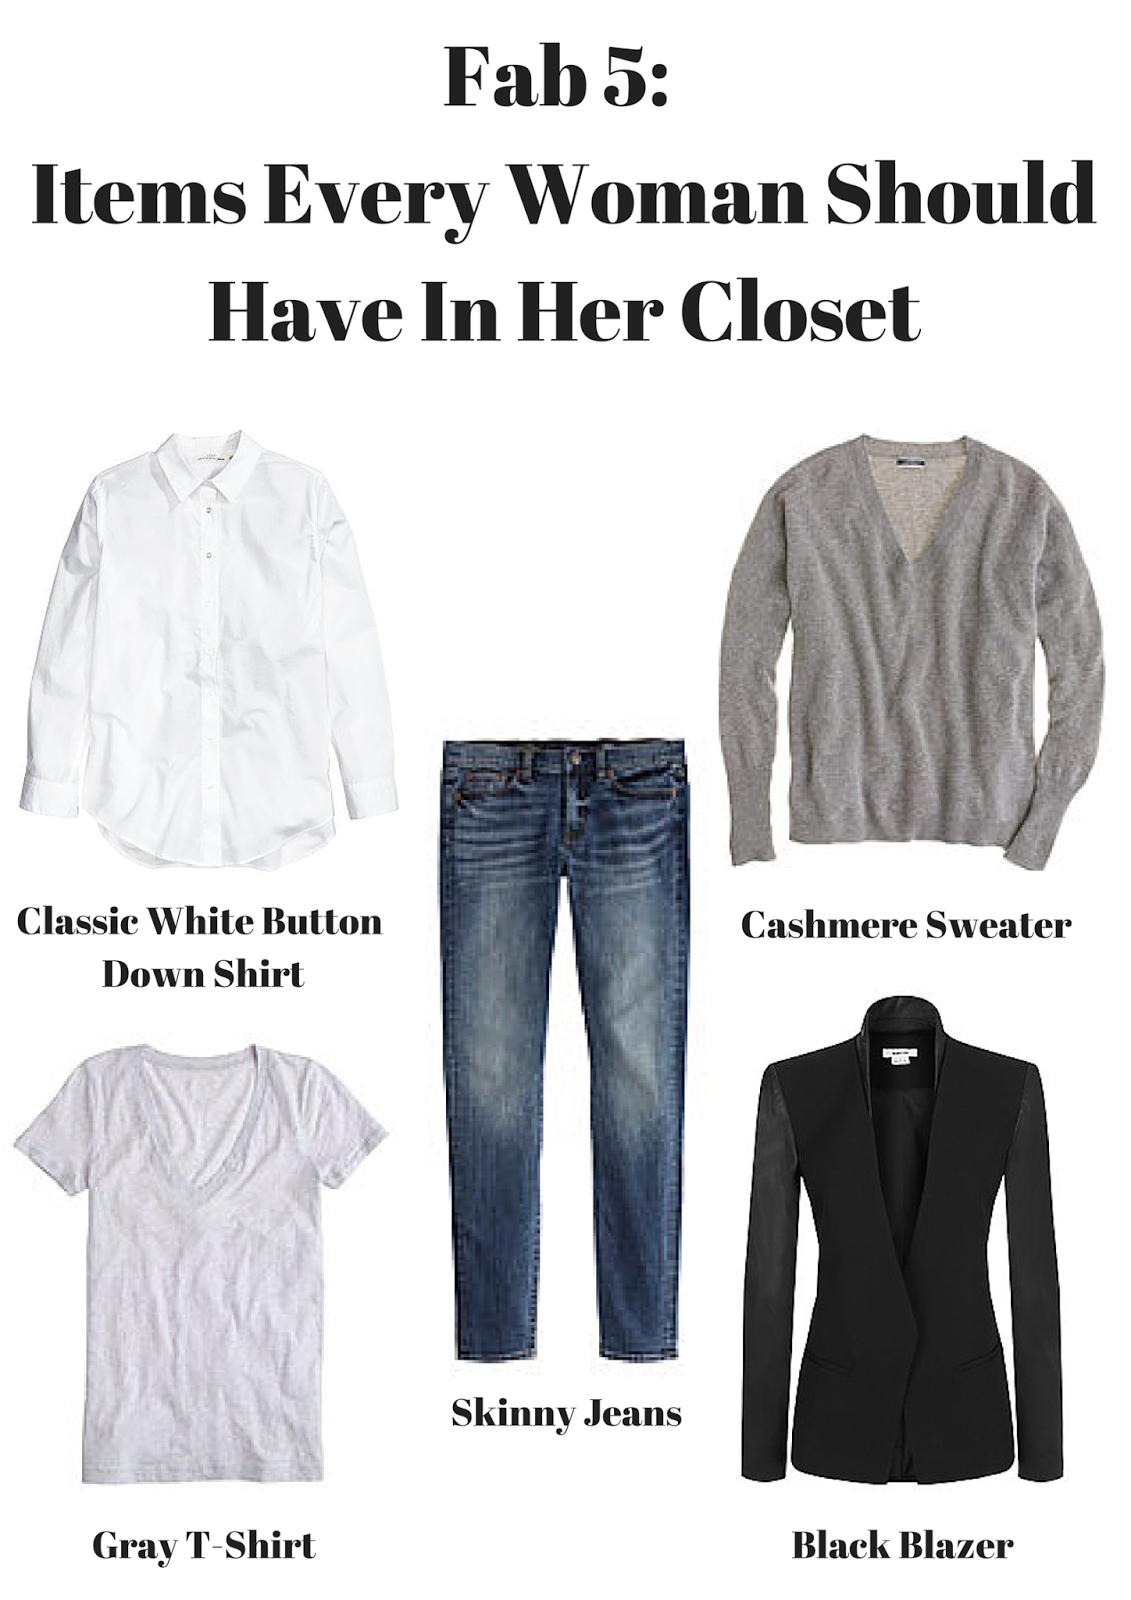 Fab 5, Closet Essentials